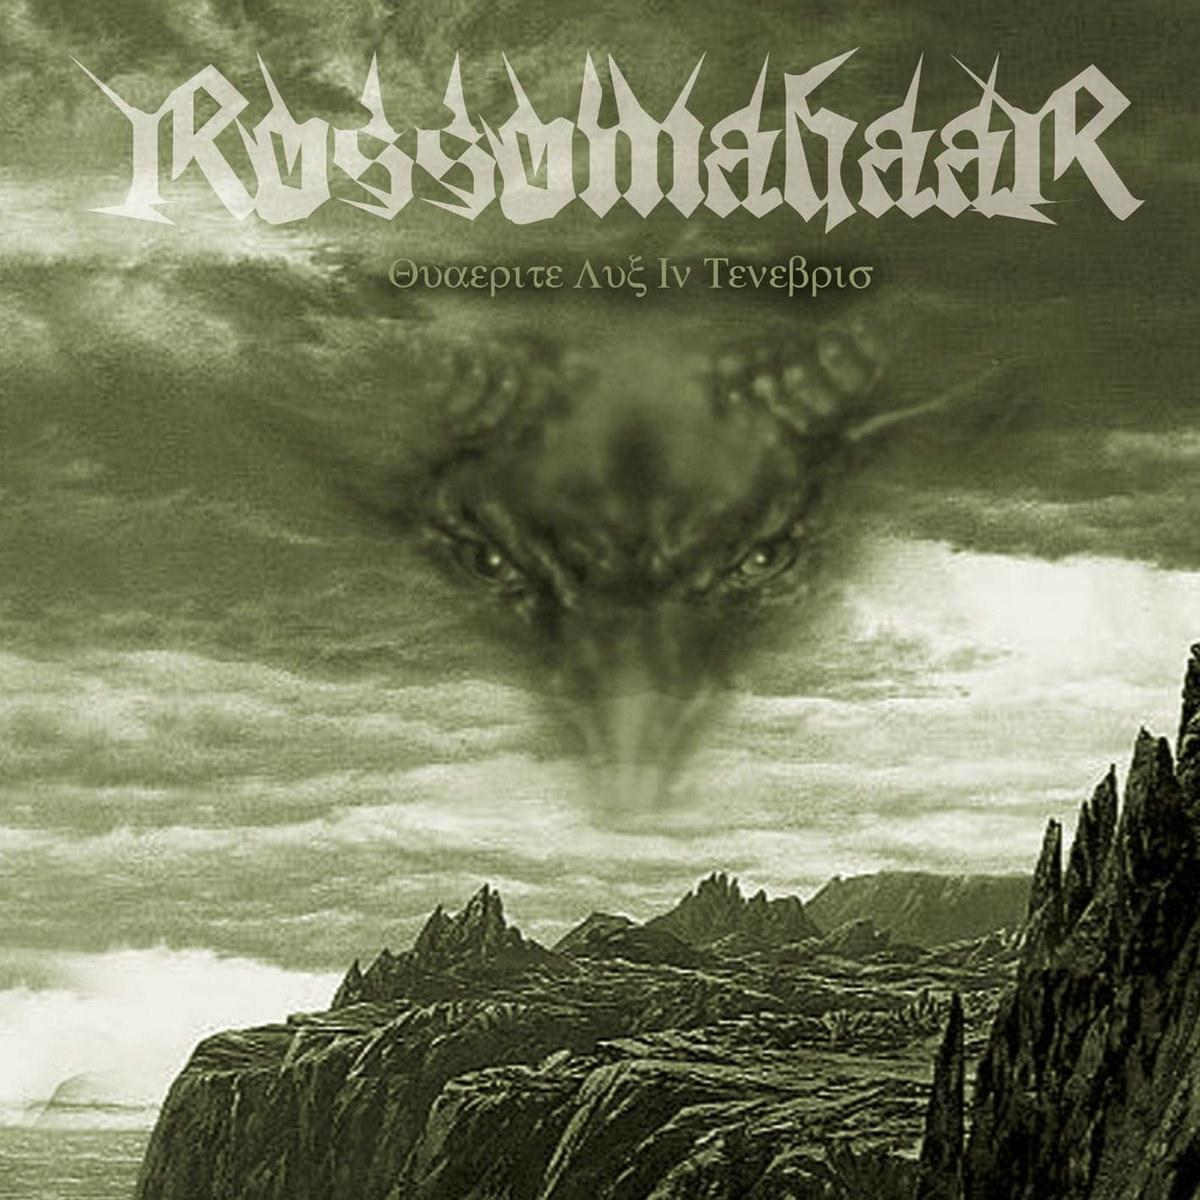 Review for Rossomahaar - Quaerite Lux in Tenebris...